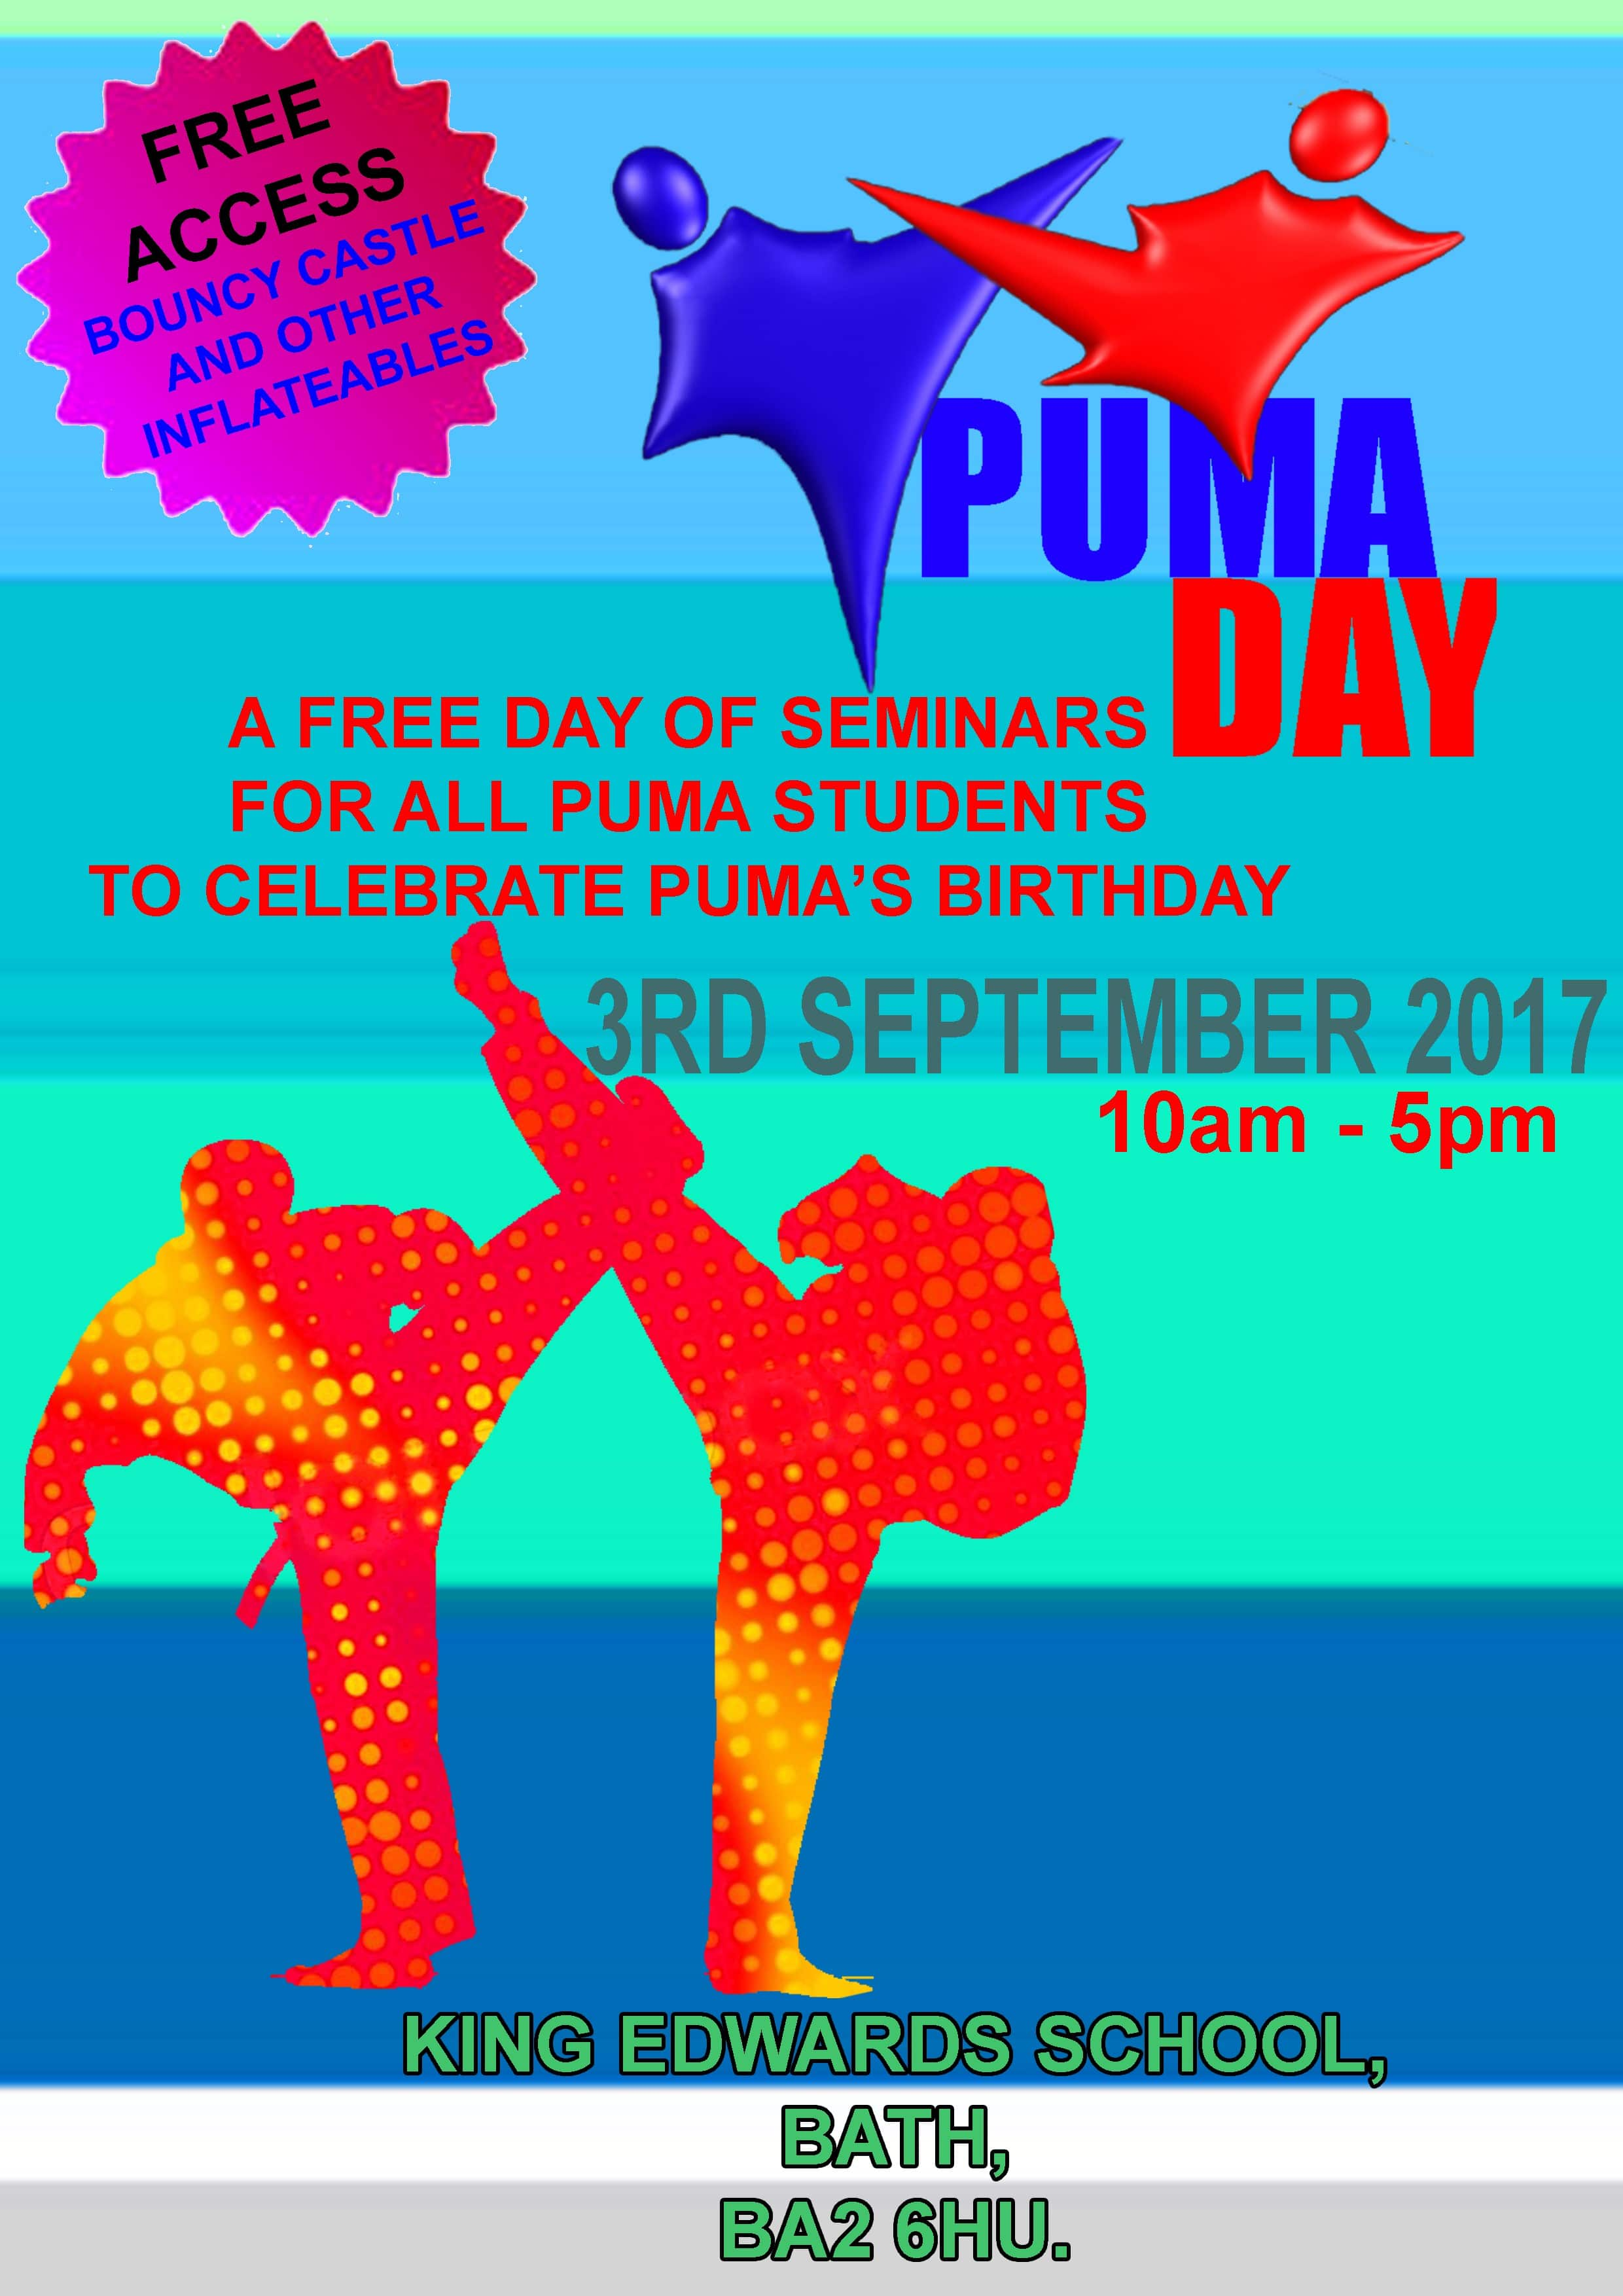 PUMA DAY Poster 2017